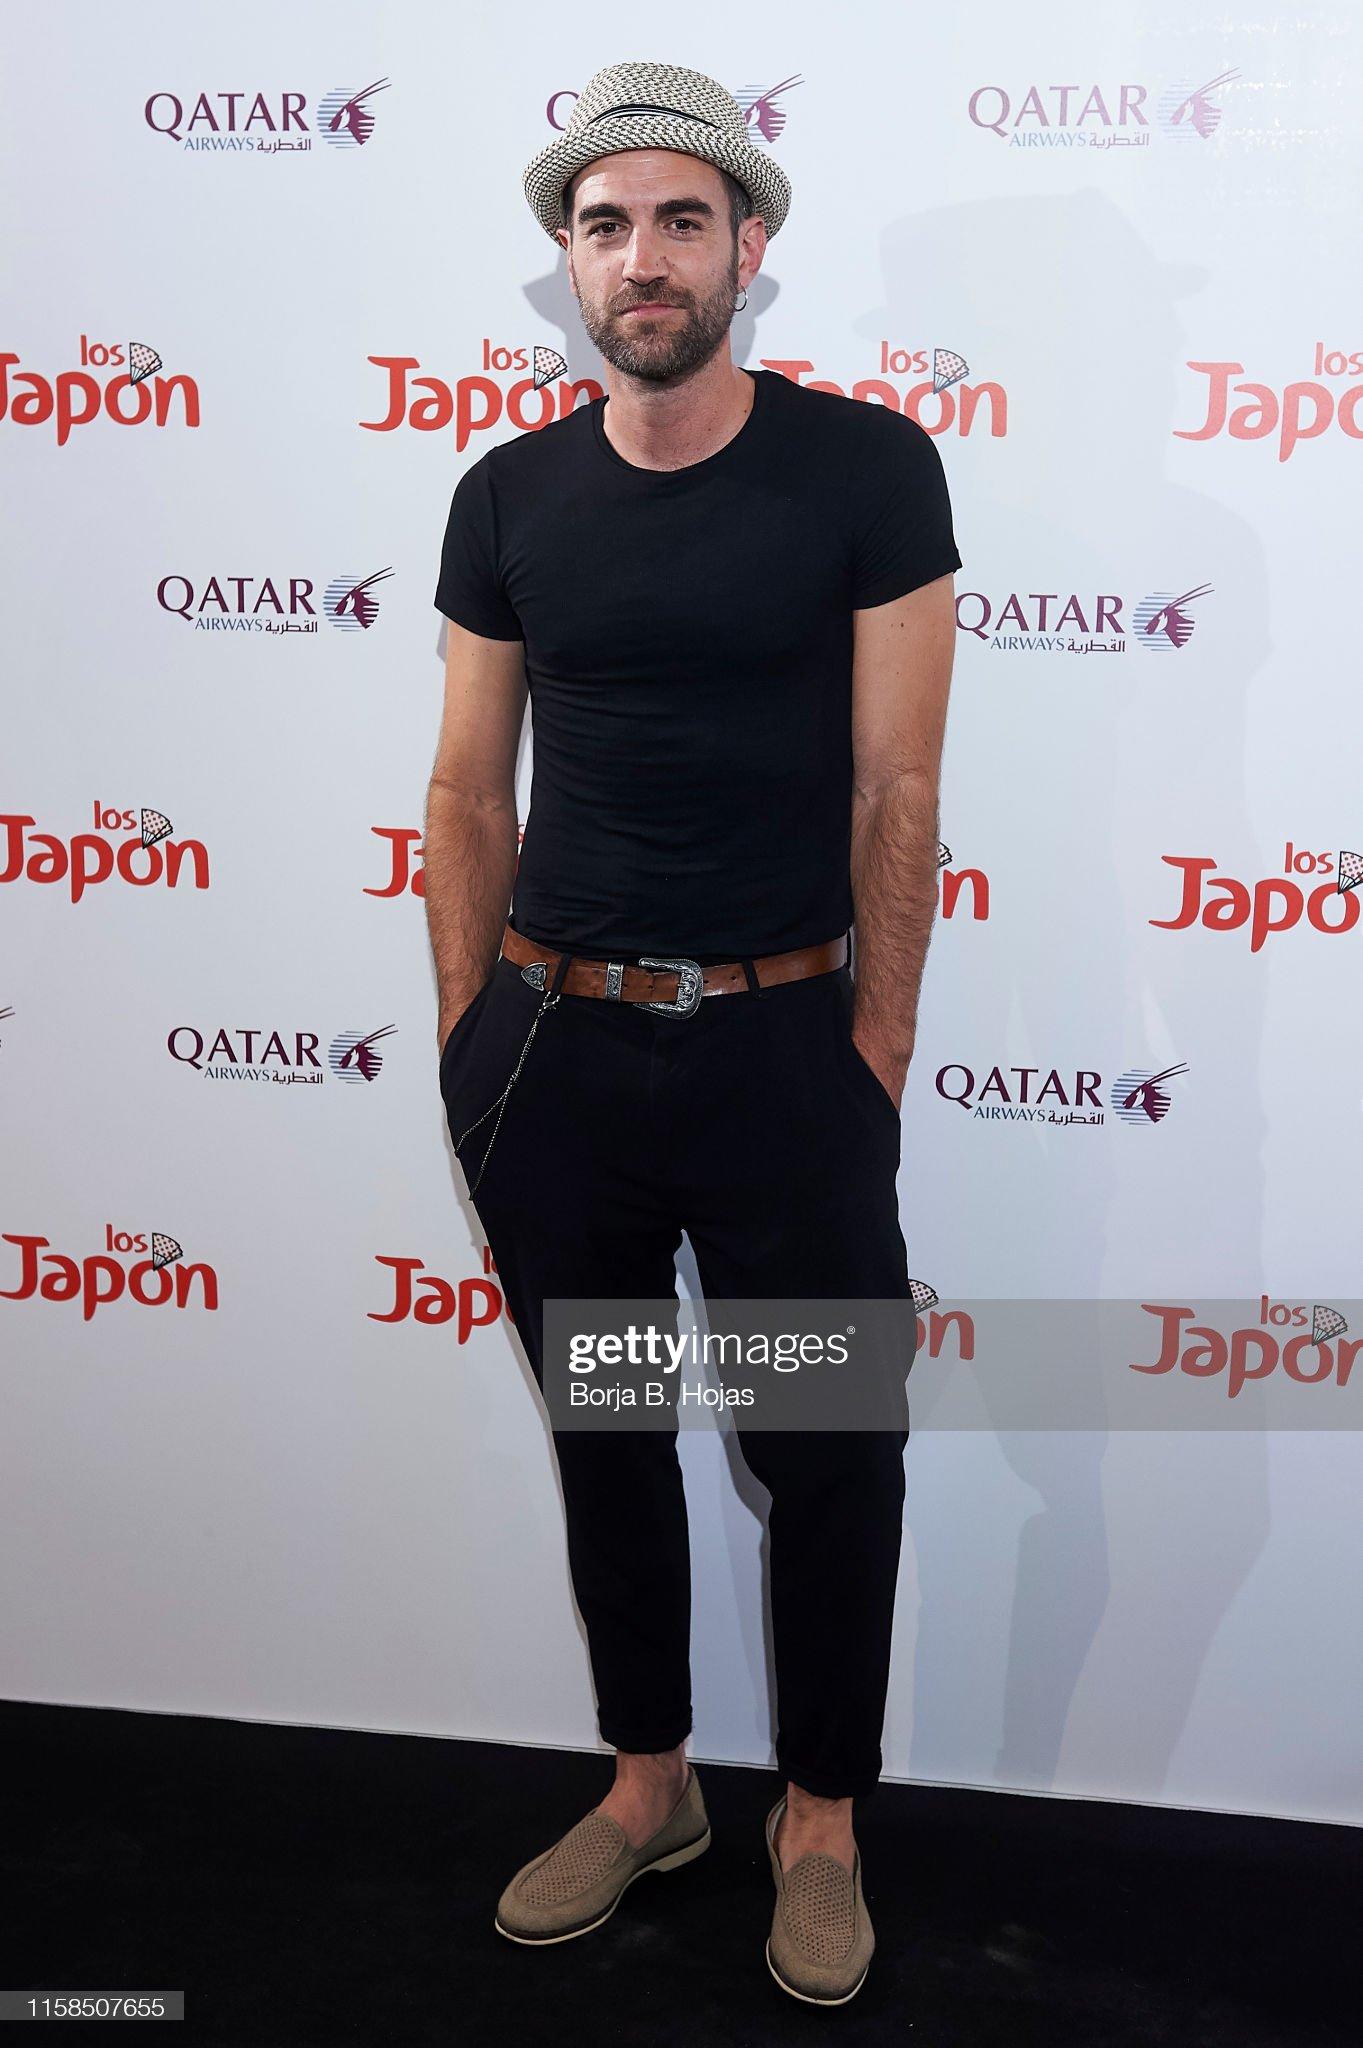 ¿Cuánto mide Jon Plazaola? - Altura Jon-plazaola-attends-los-japon-party-at-ramses-restaurant-on-june-26-picture-id1158507655?s=2048x2048